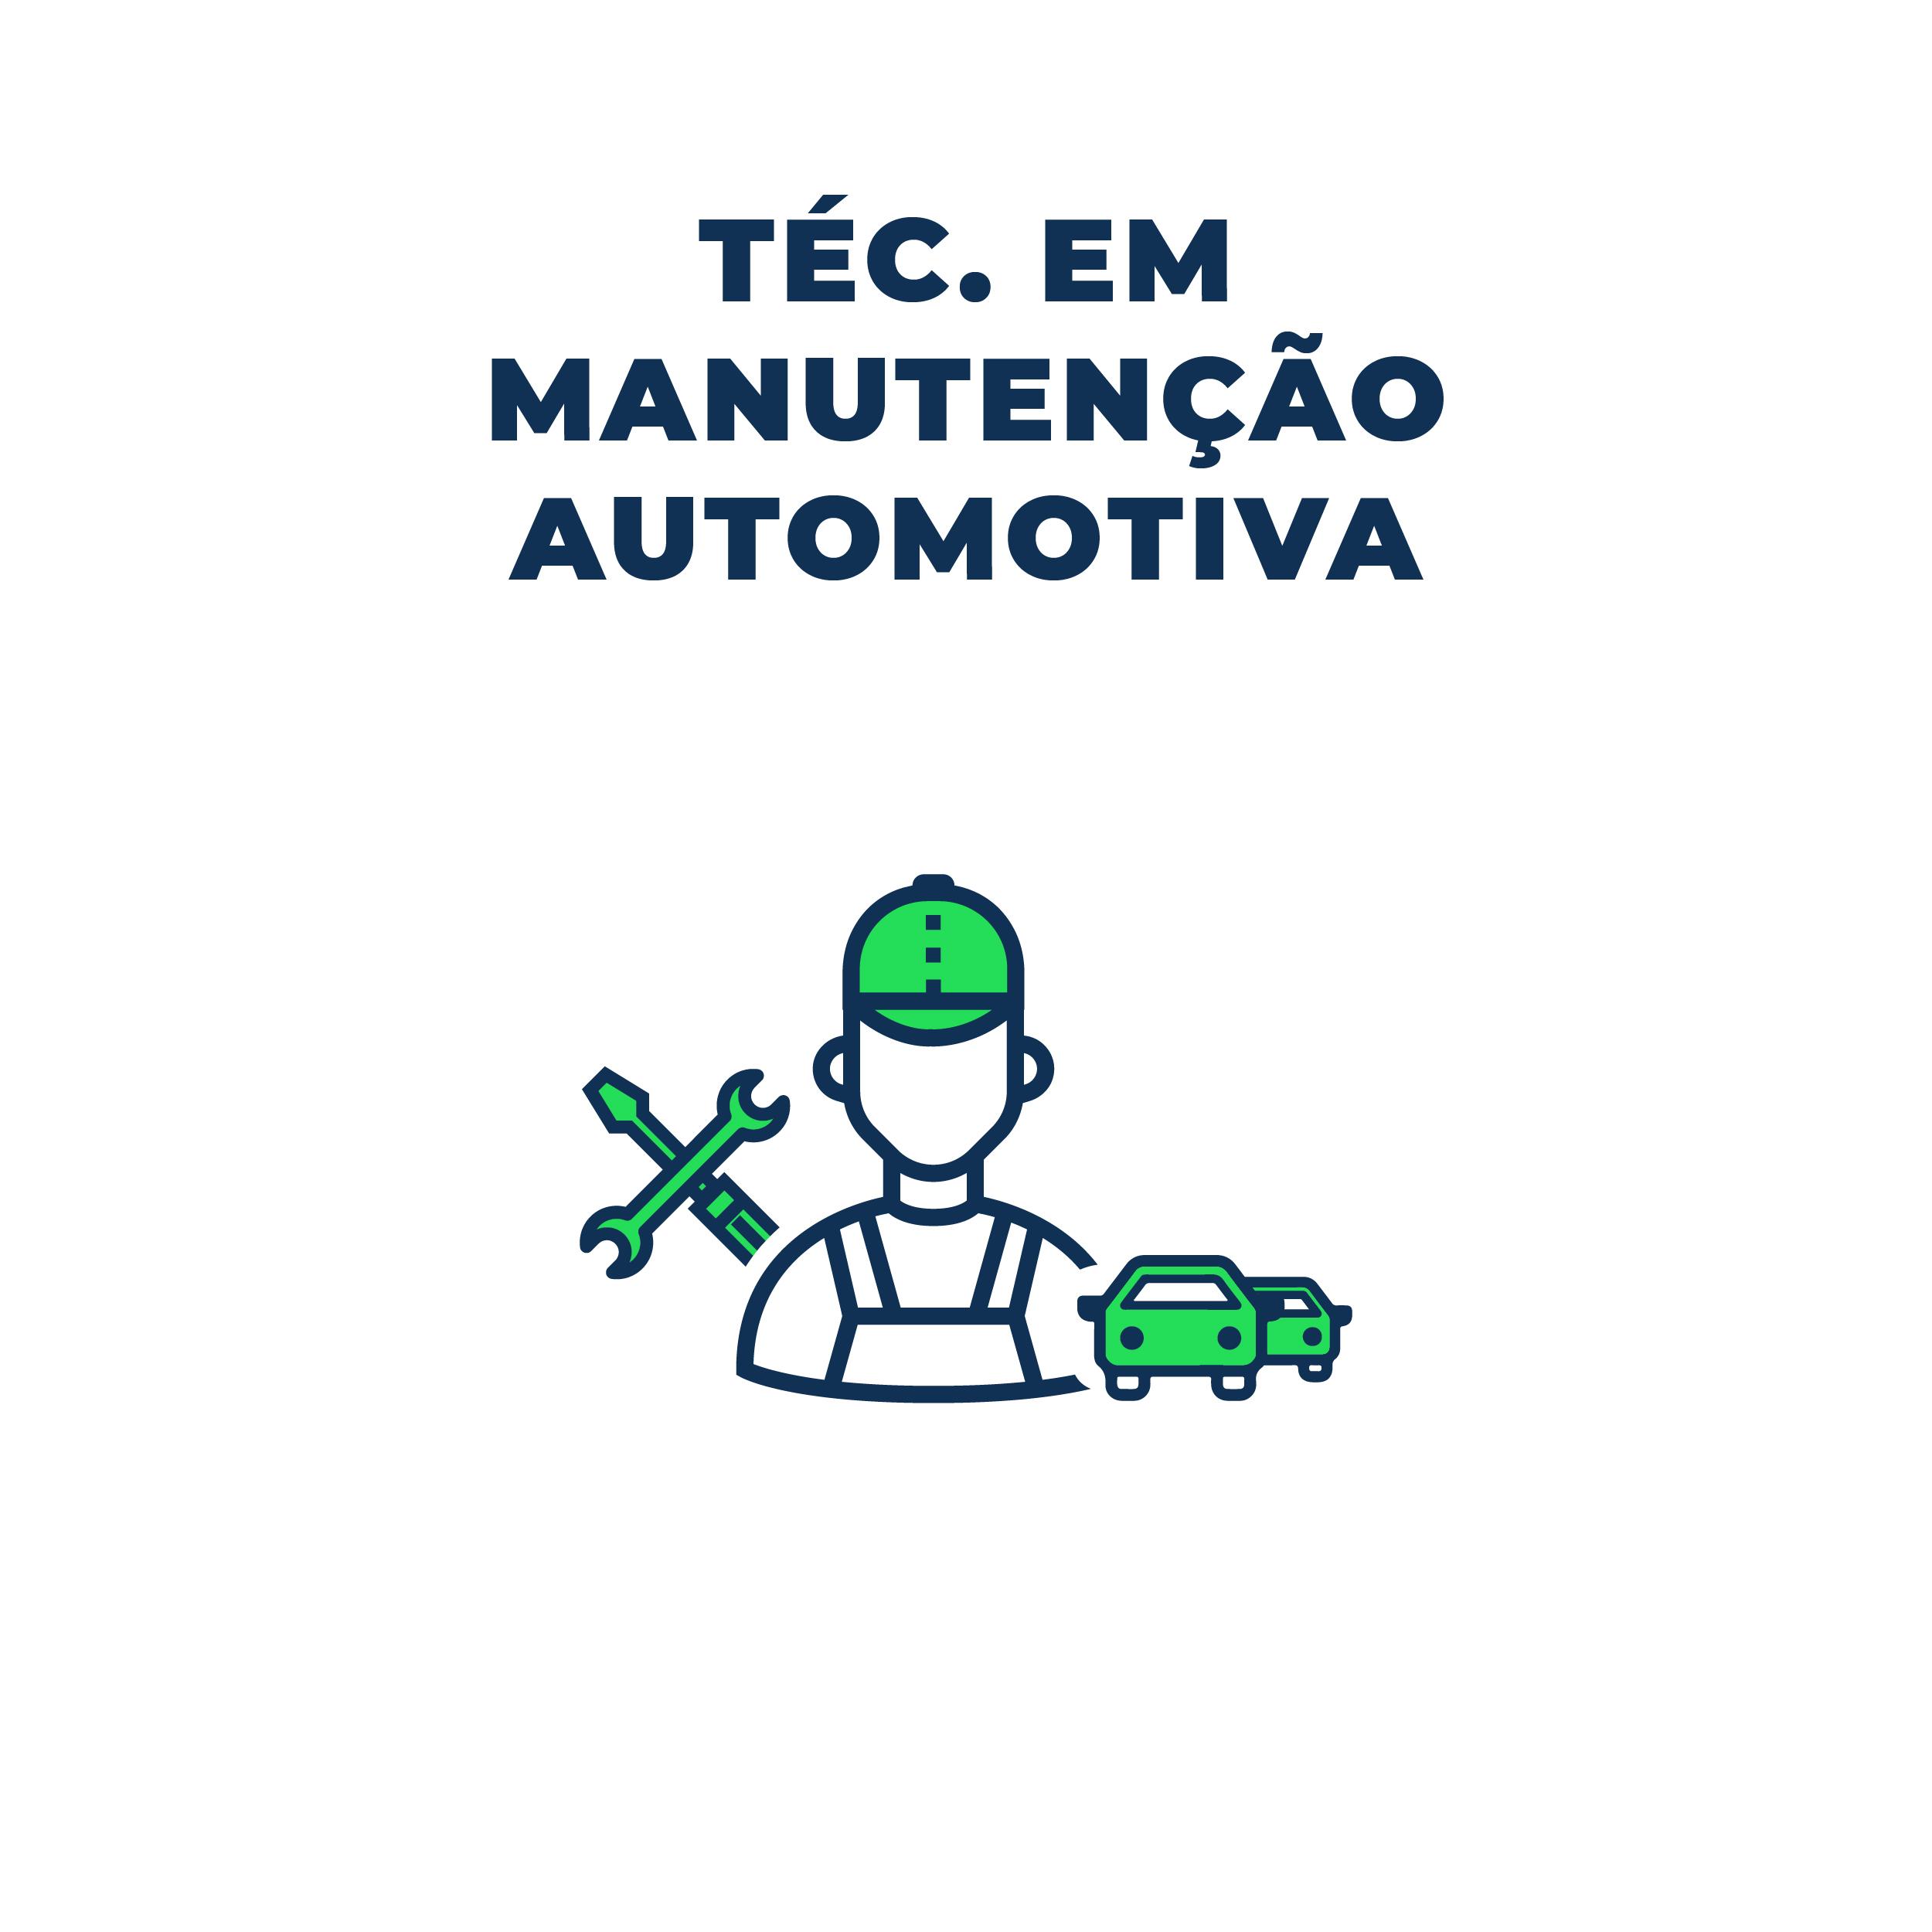 manutenção automotivas